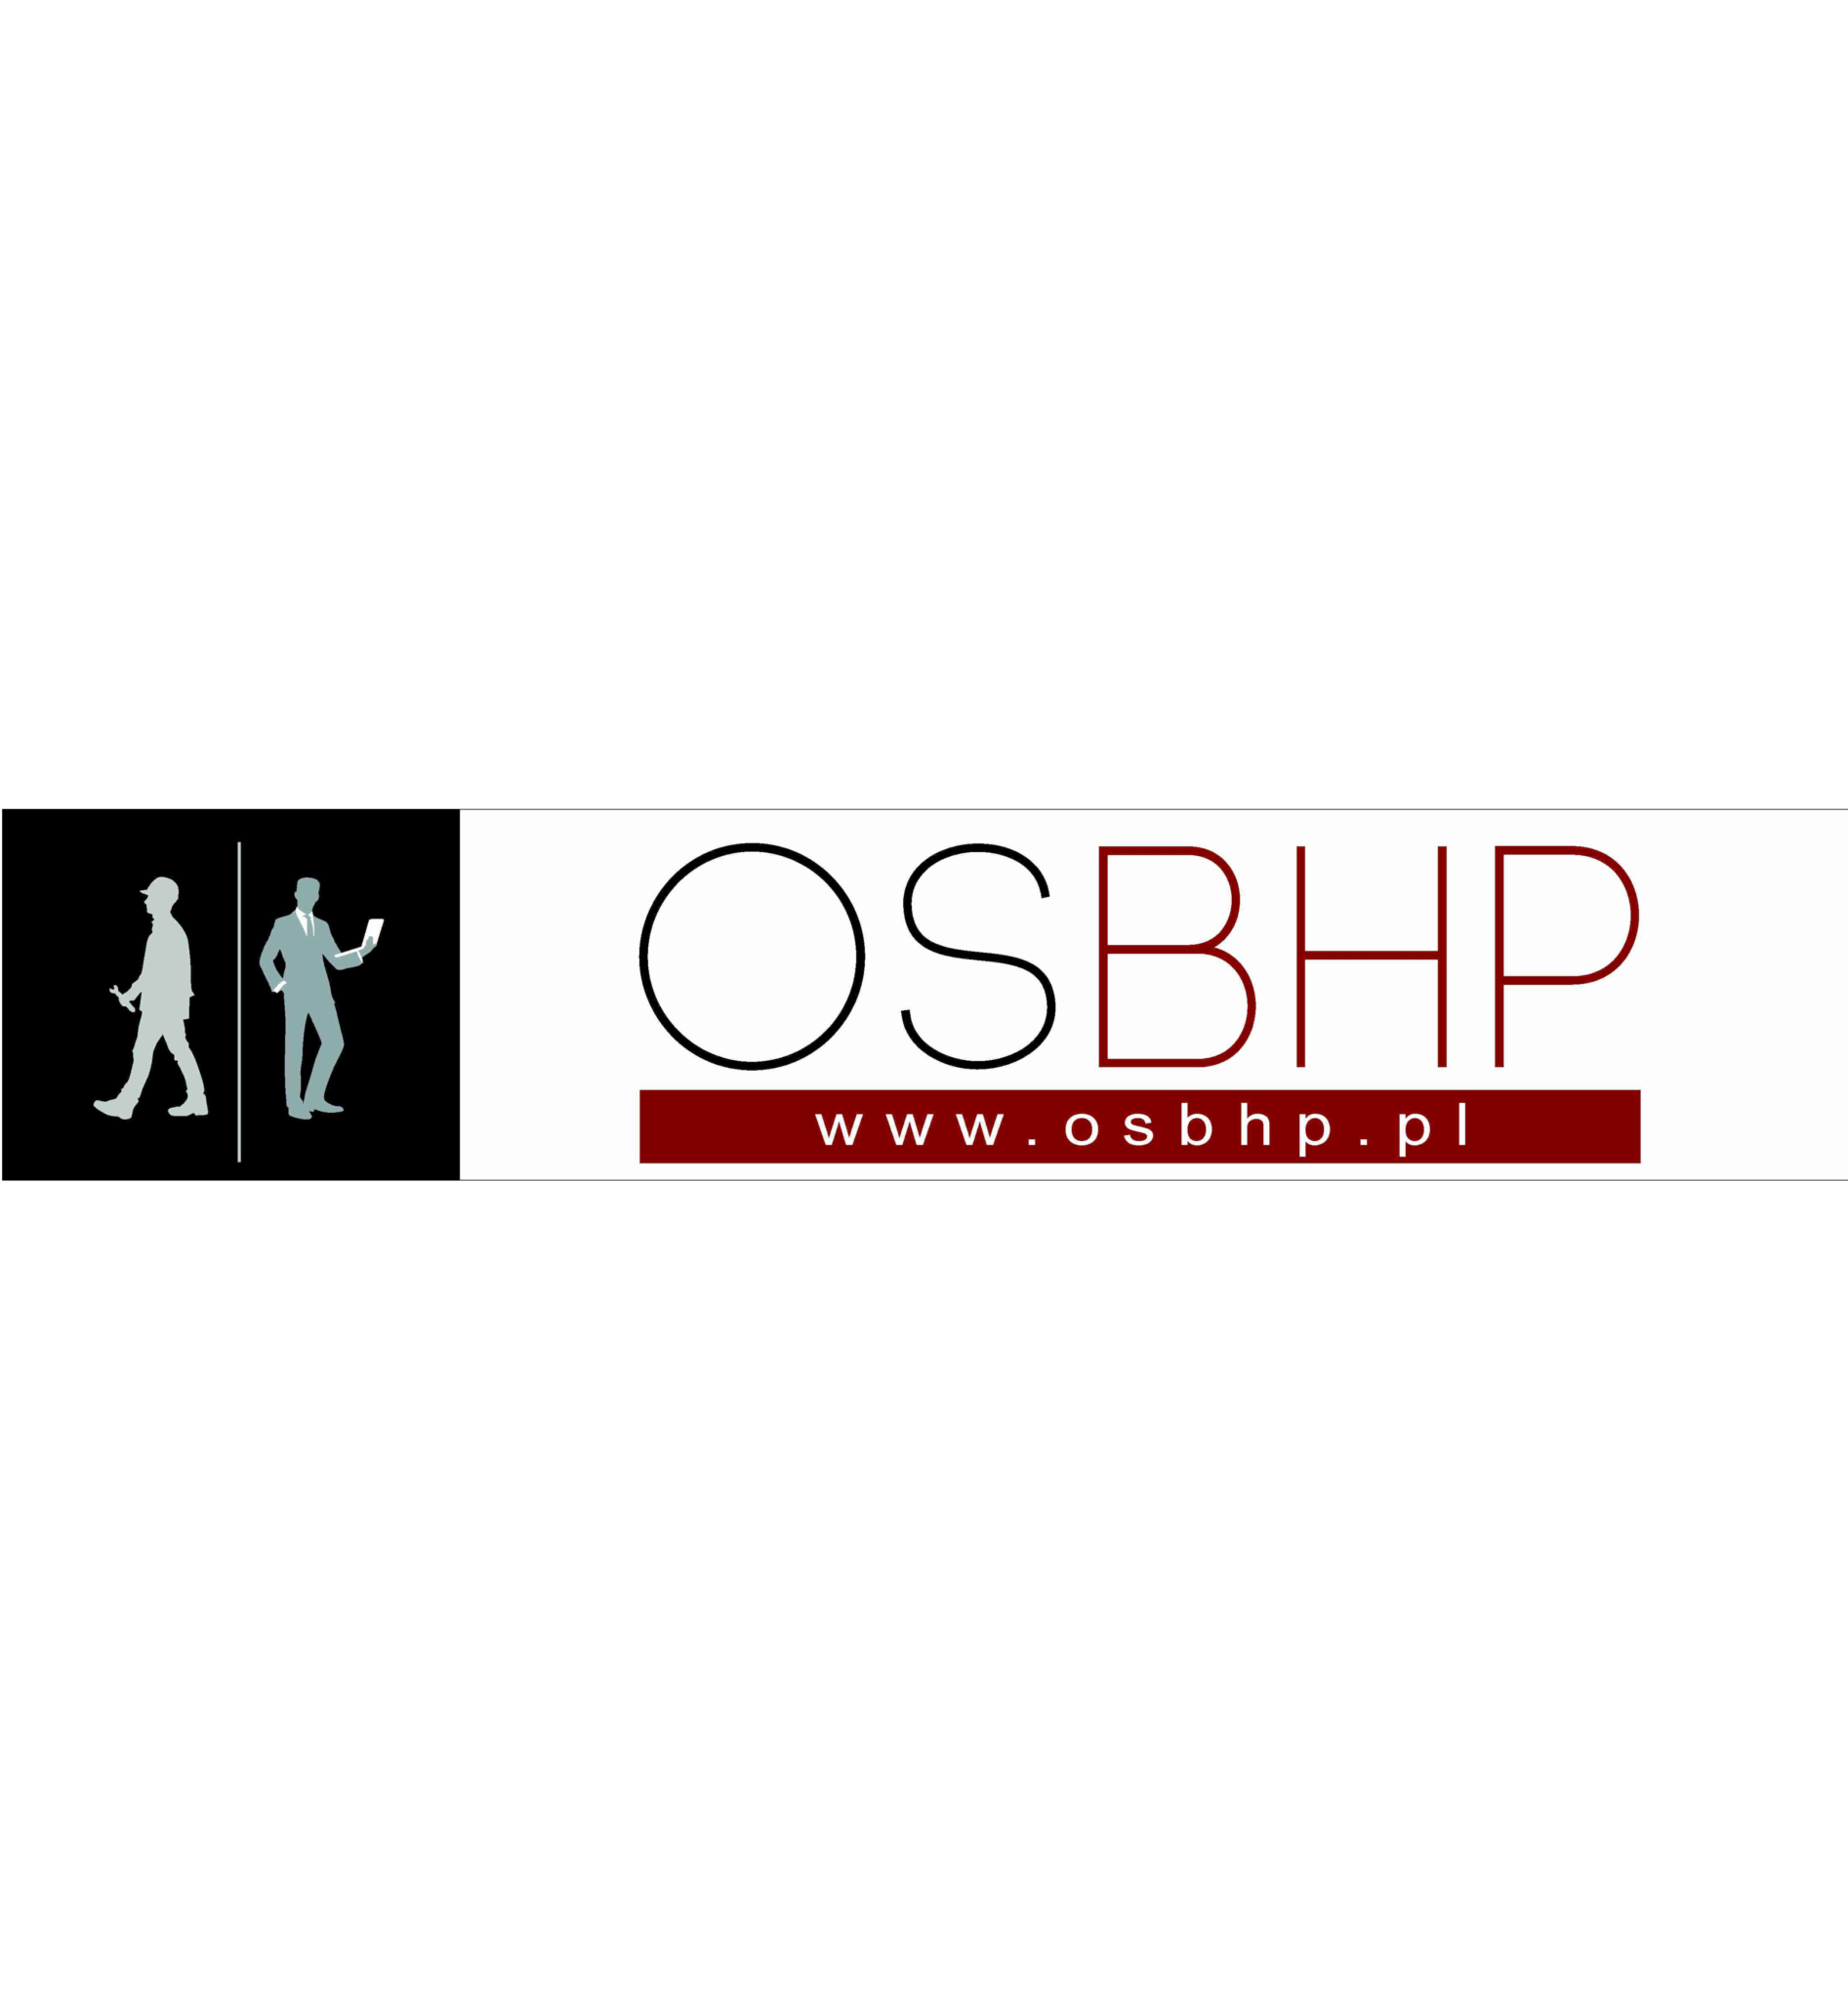 OSBHP